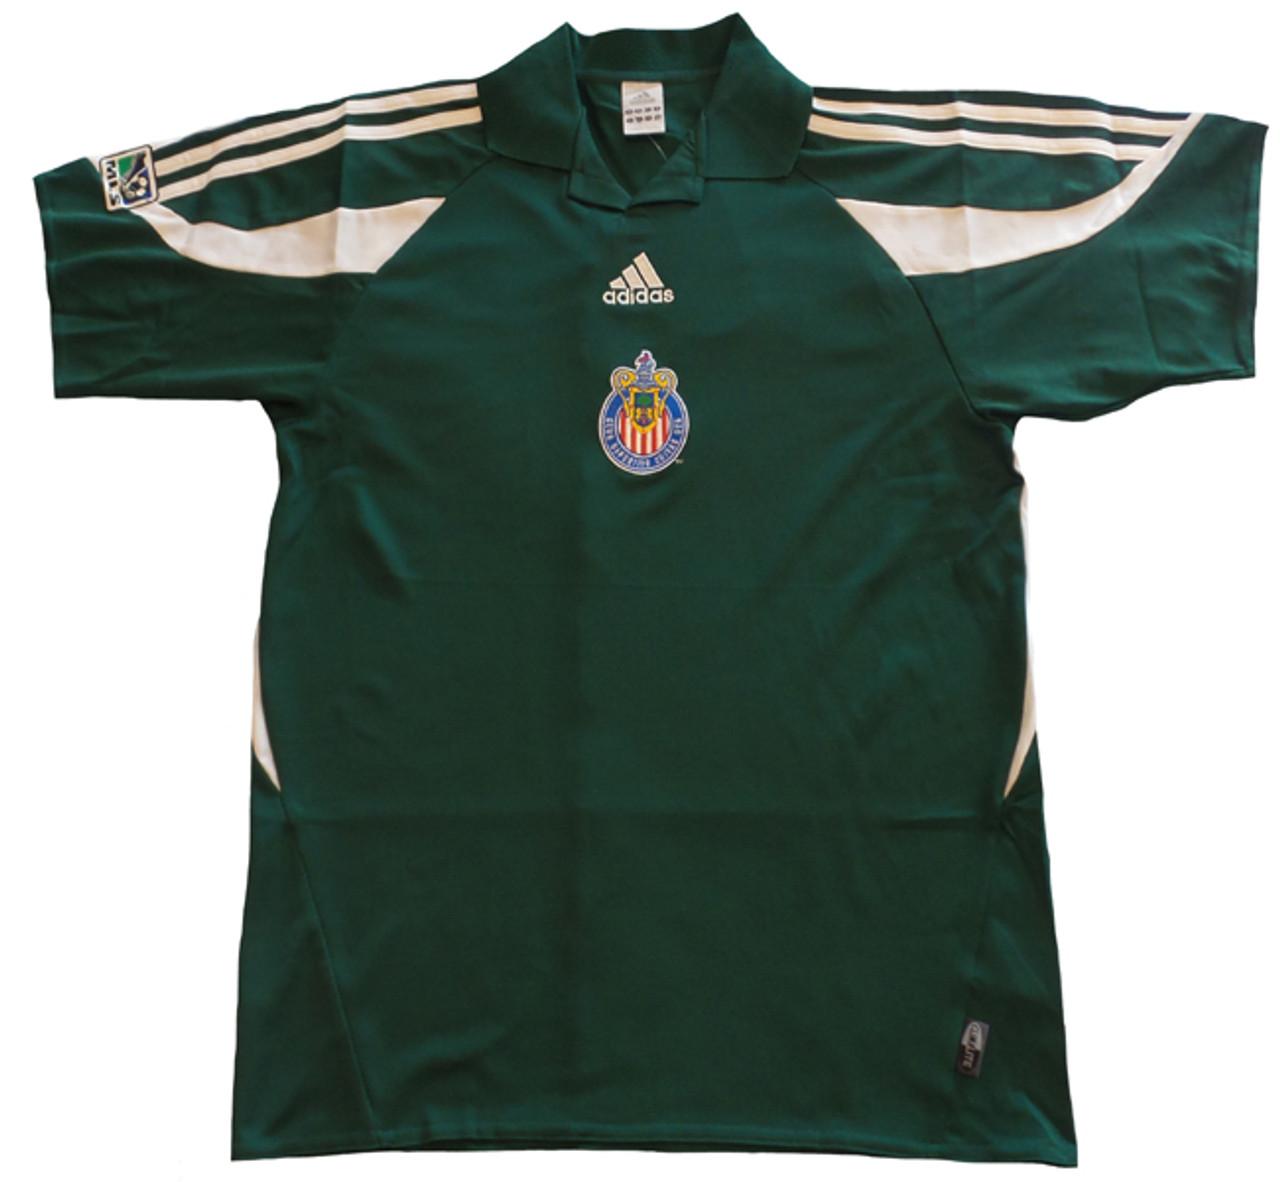 sale retailer 678c3 9d3d7 ADIDAS CHIVAS USA 2005 GREEN JERSEY LIMITED